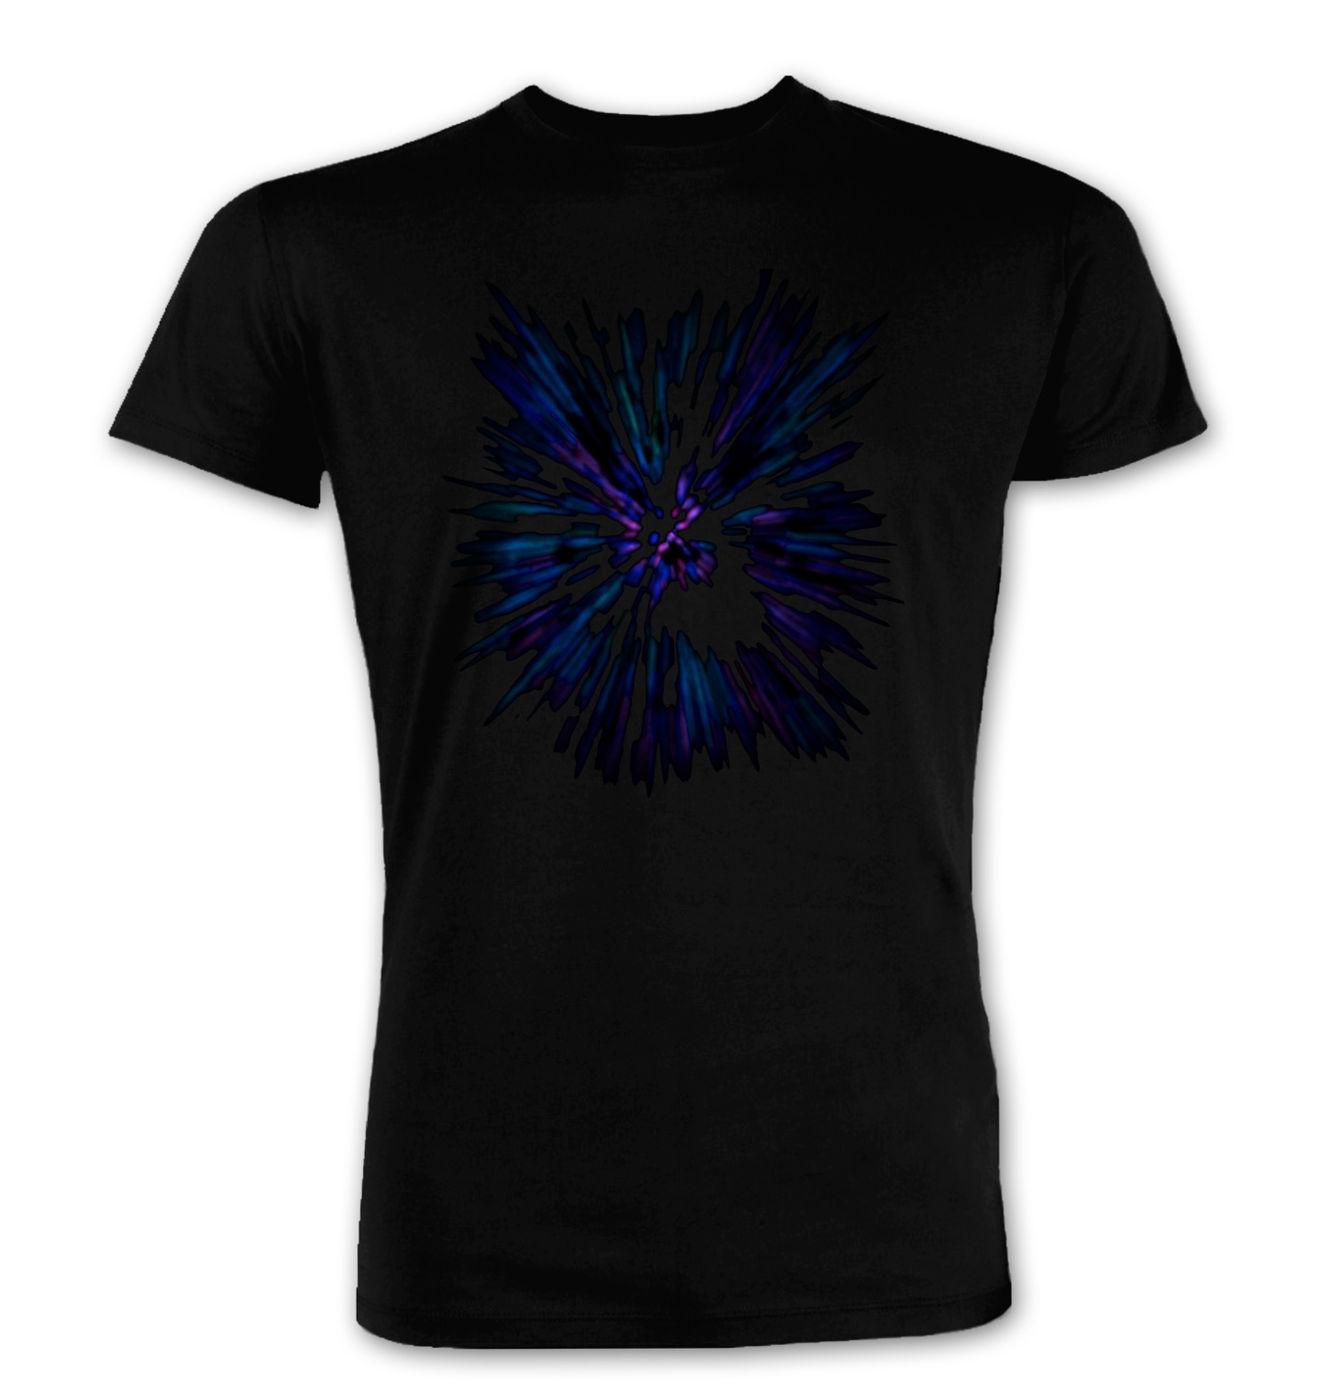 Lightspeed Woosh (Purple) premium t-shirt by Something Geeky